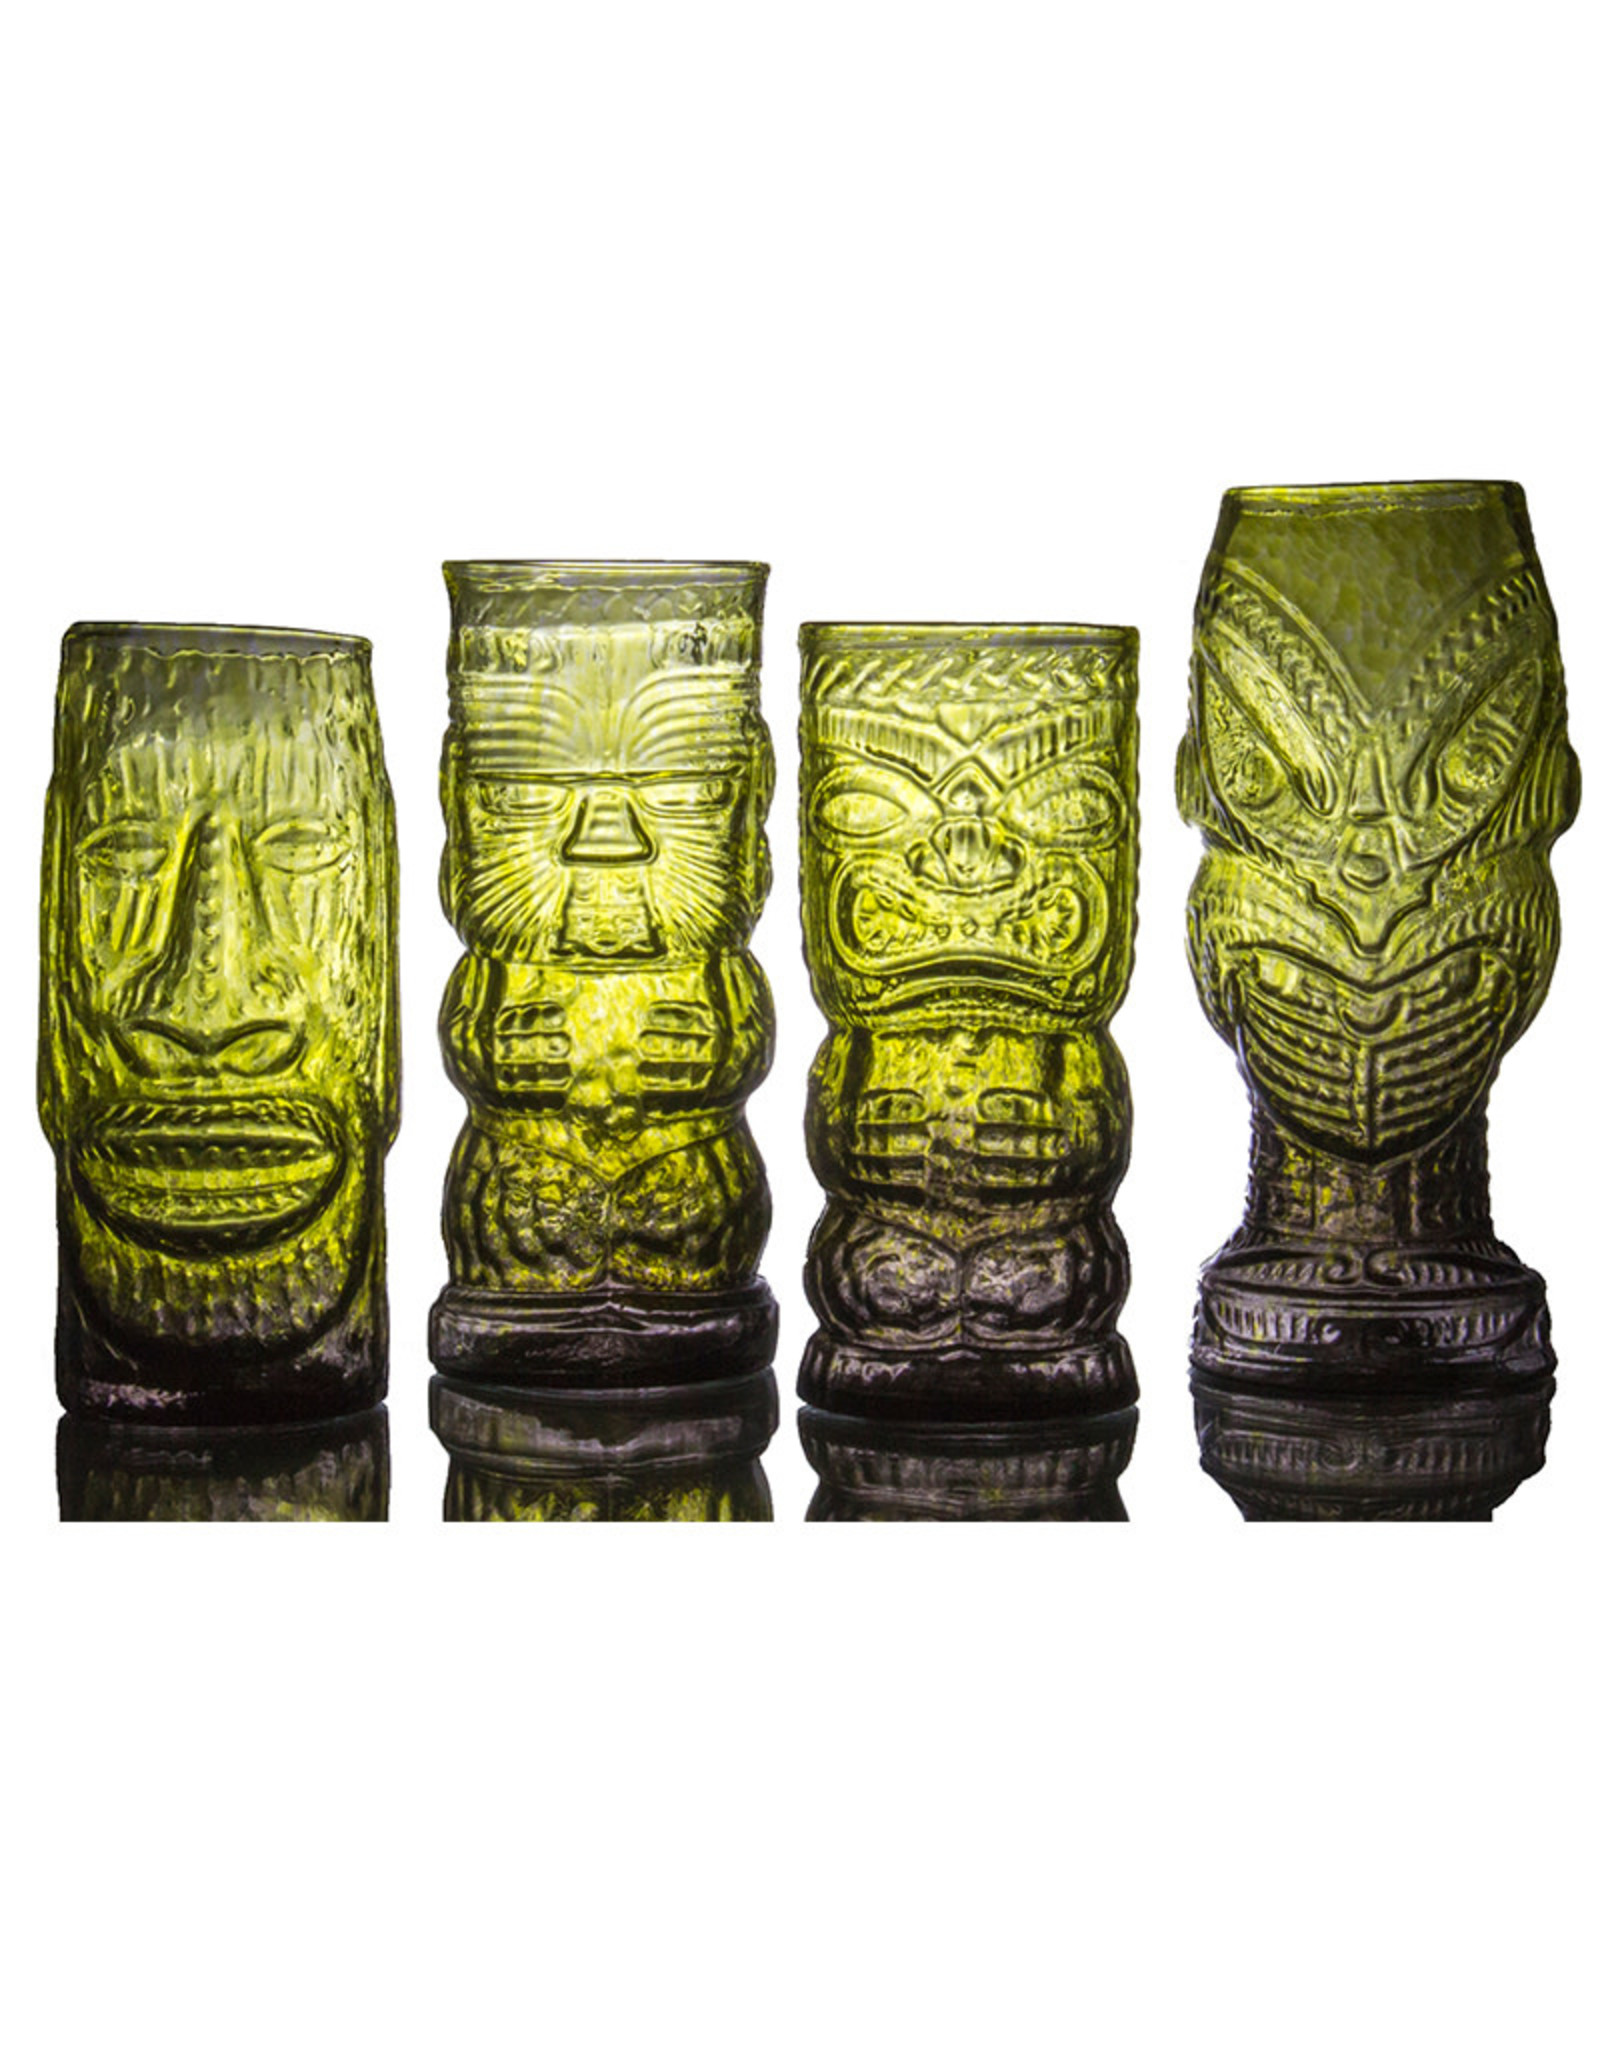 IANNAZZI GLASS DESIGN MOAI JUNGLE FOG GLASS TIKI MUG